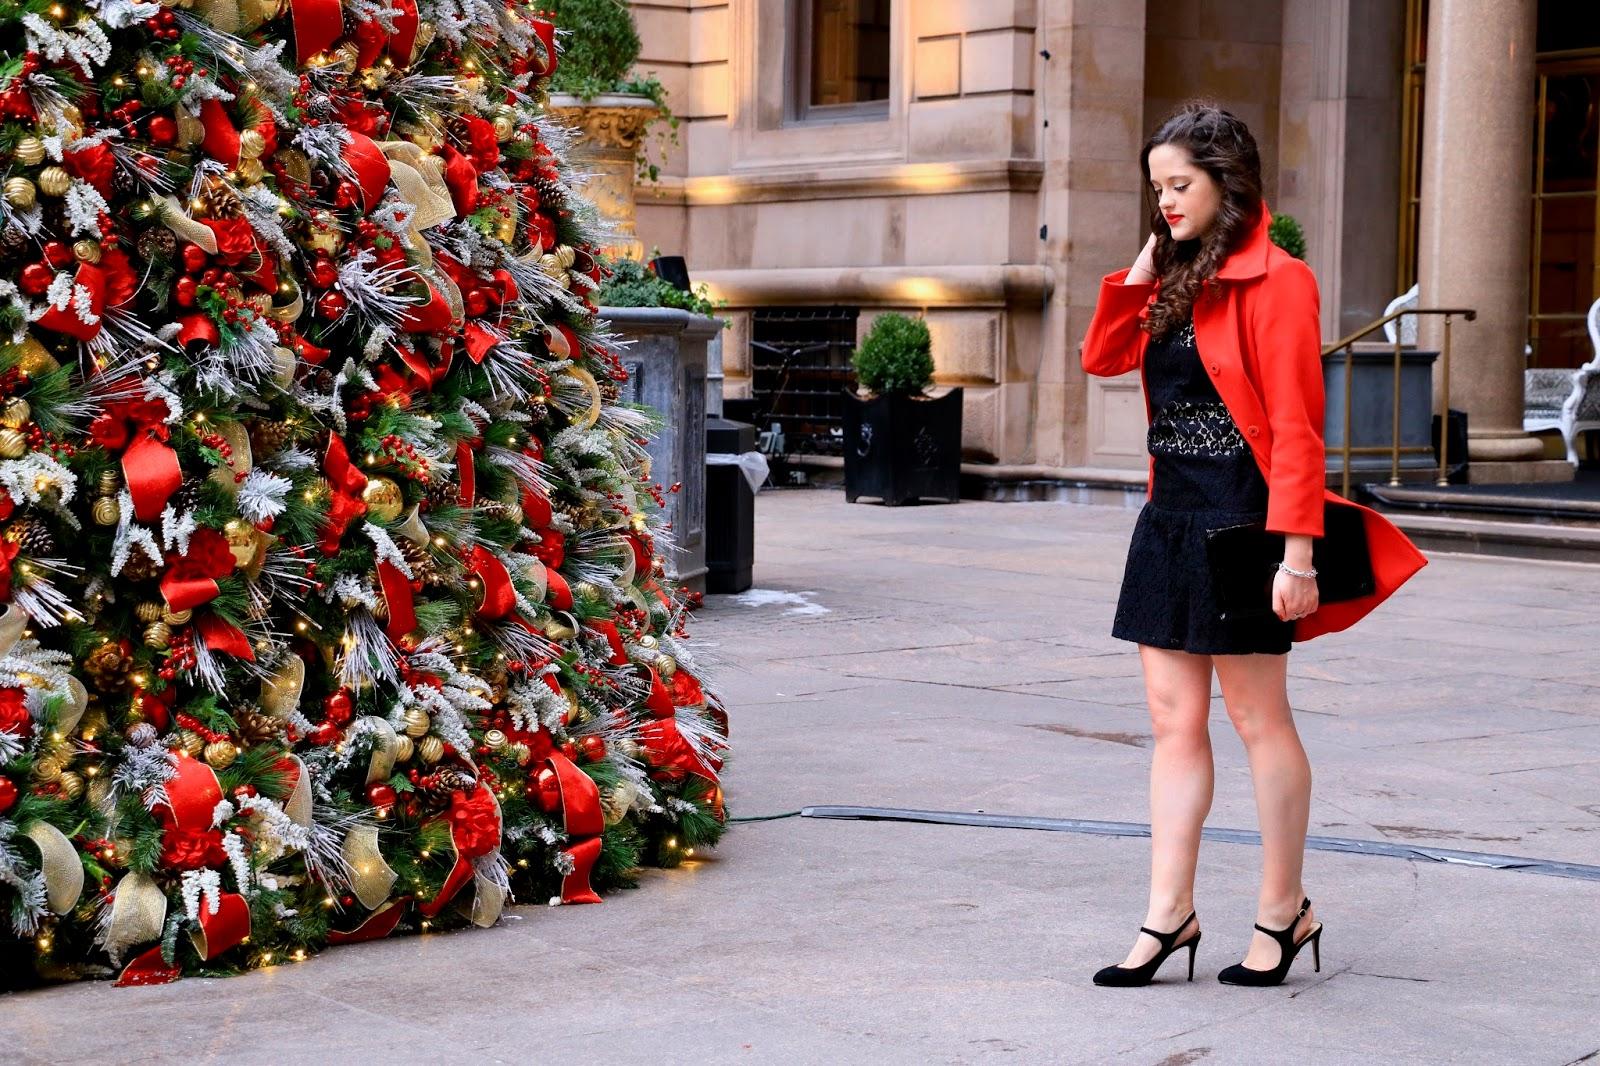 nyc fashion blogger holiday pics